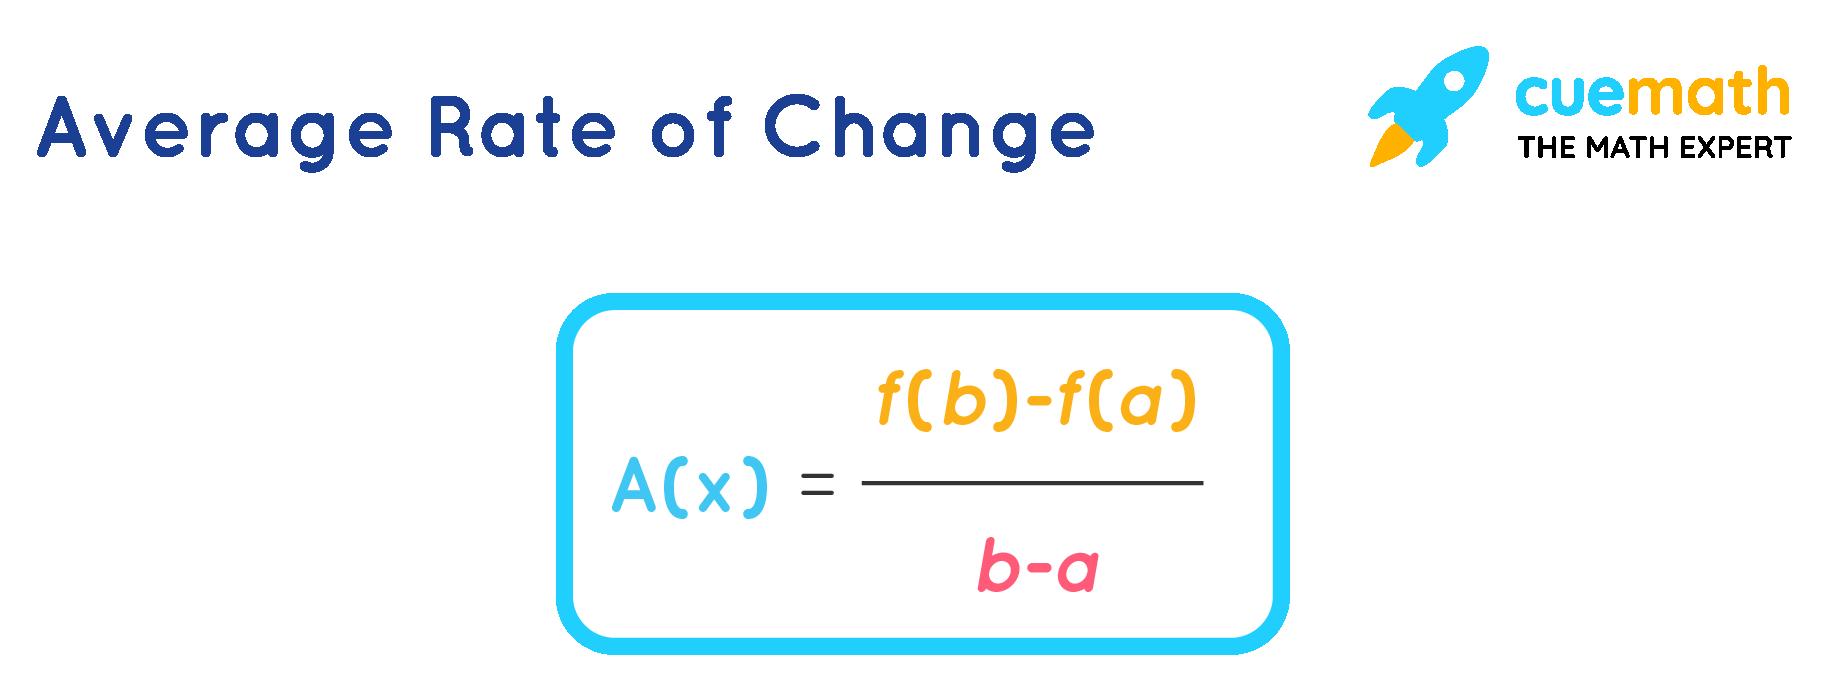 Average Rate of Change Formula